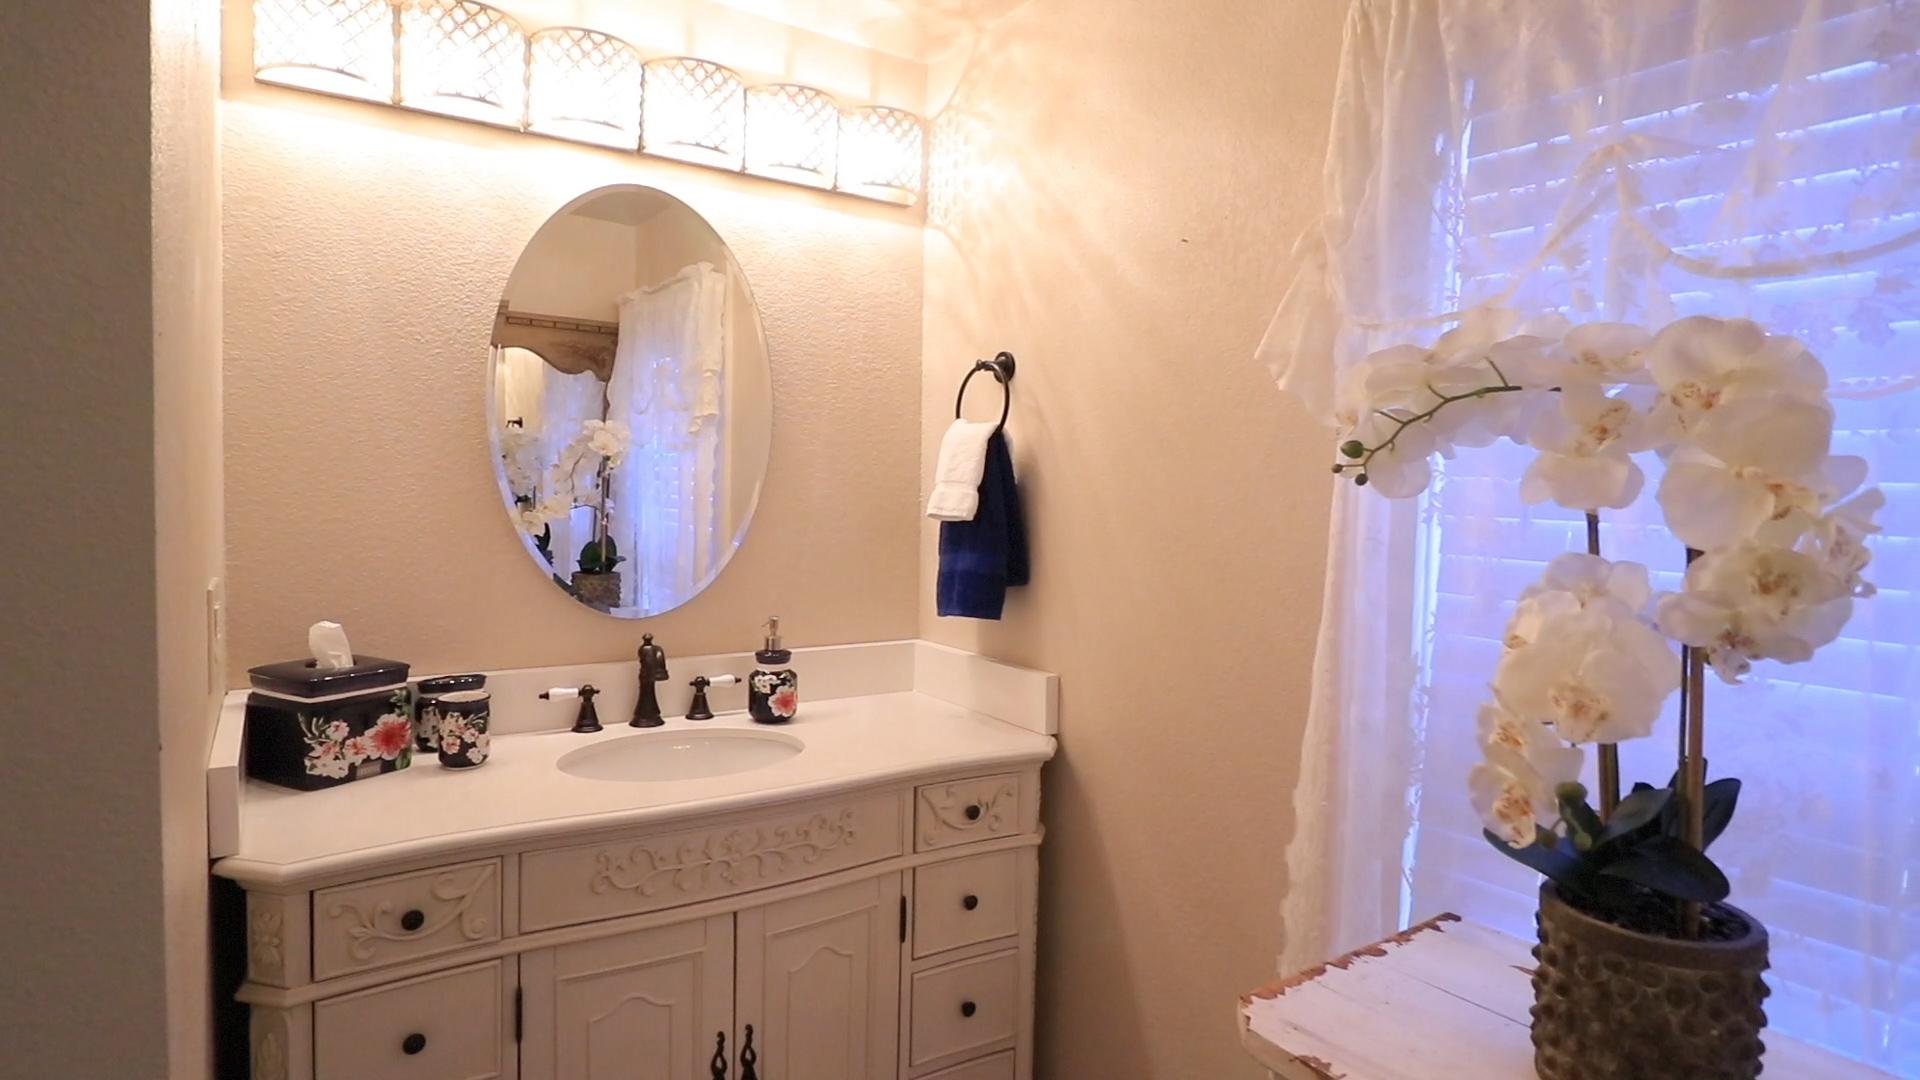 bbathroom in bb room.jpg